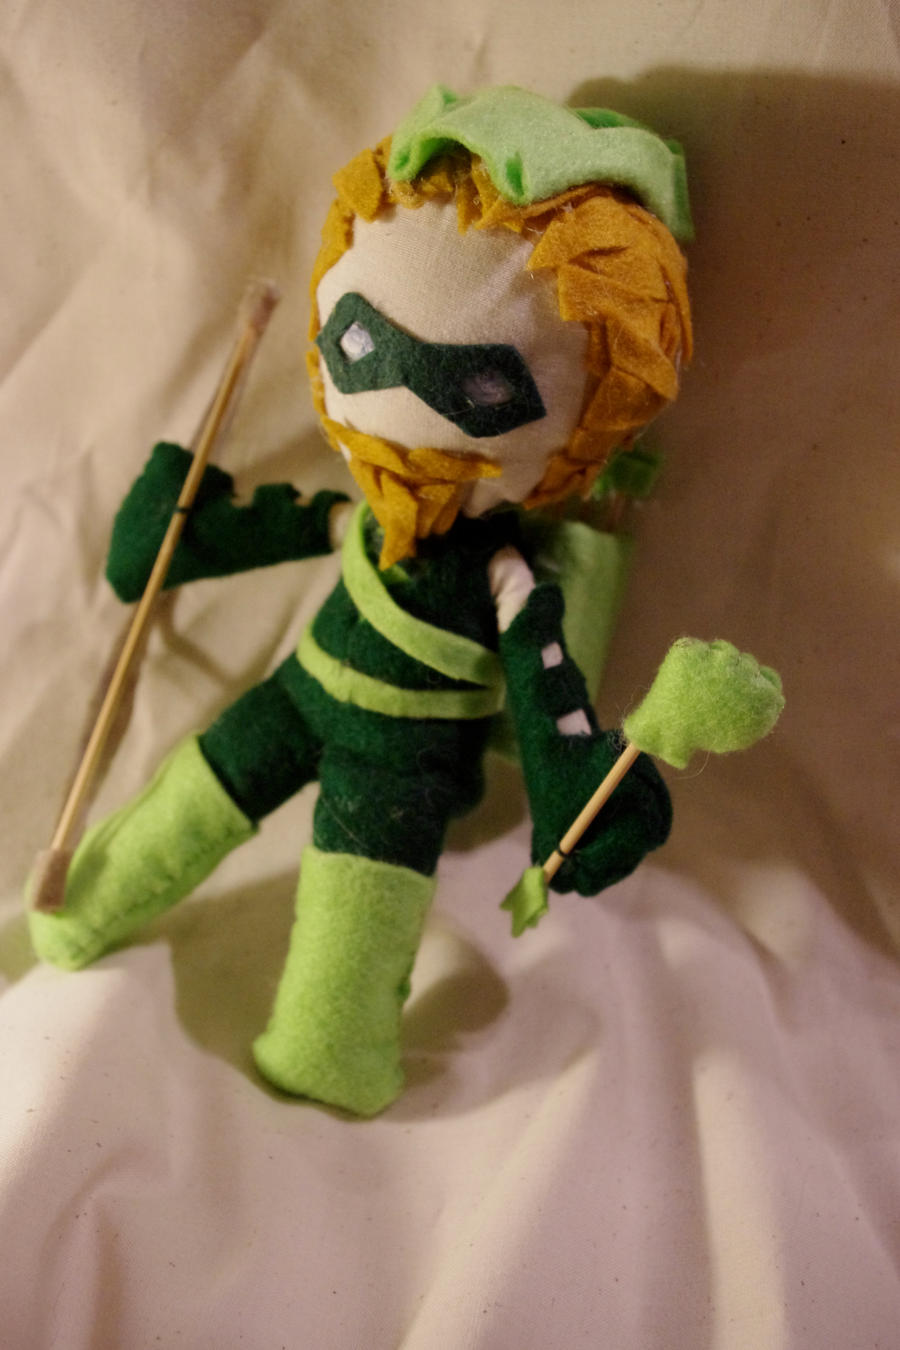 Green Arrow by deense